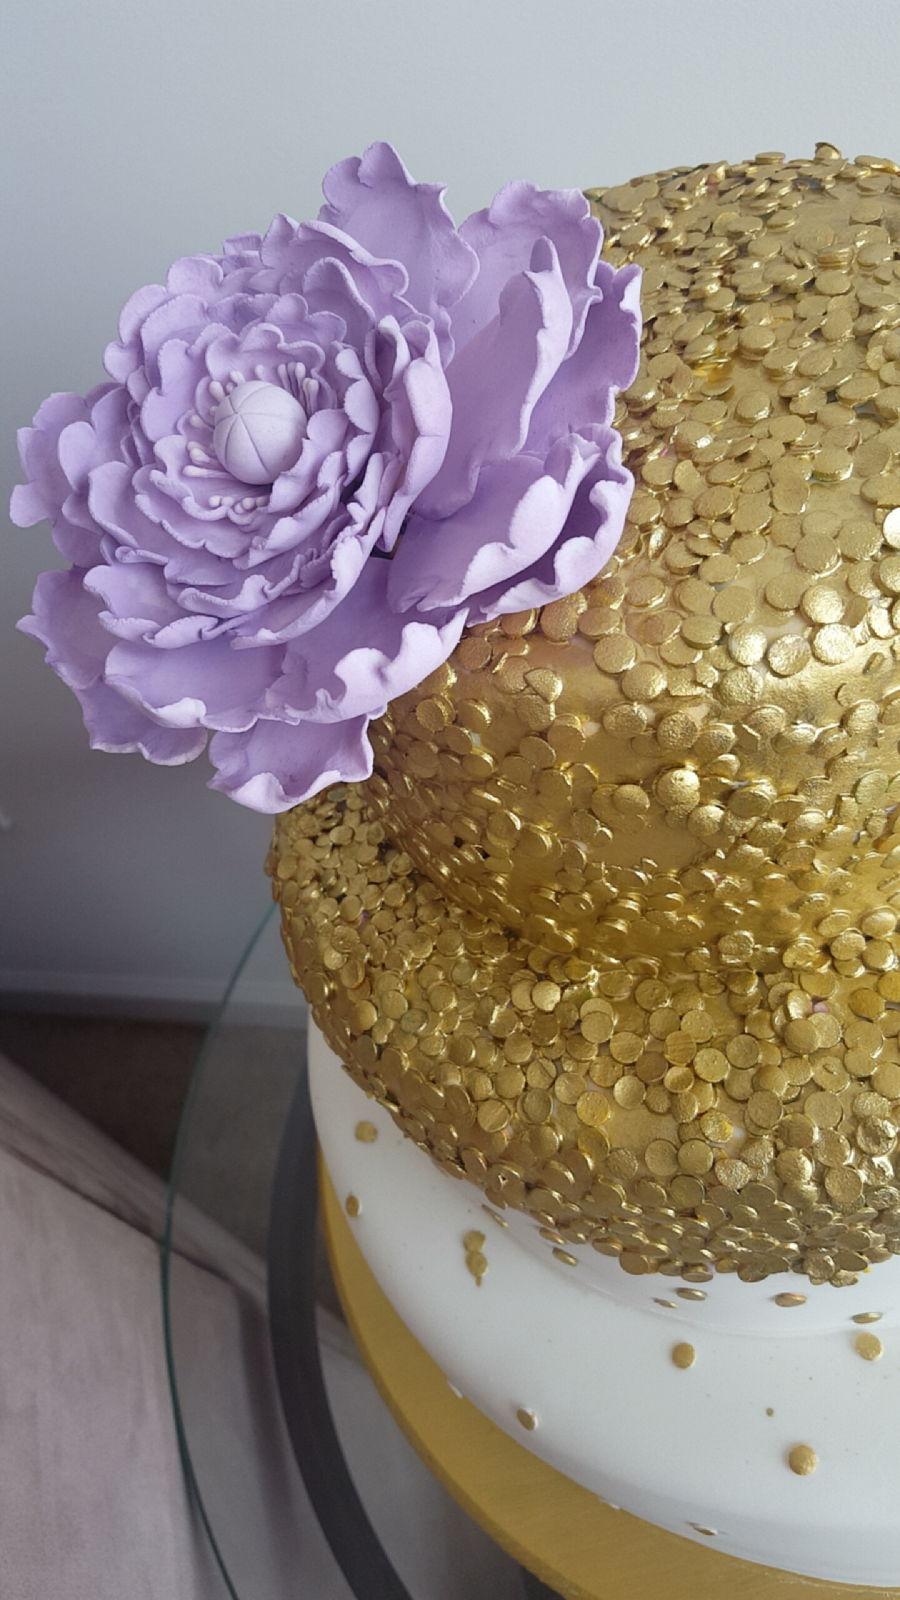 Gold Sequin Cake Decoration : Sequin Wedding Cake - CakeCentral.com